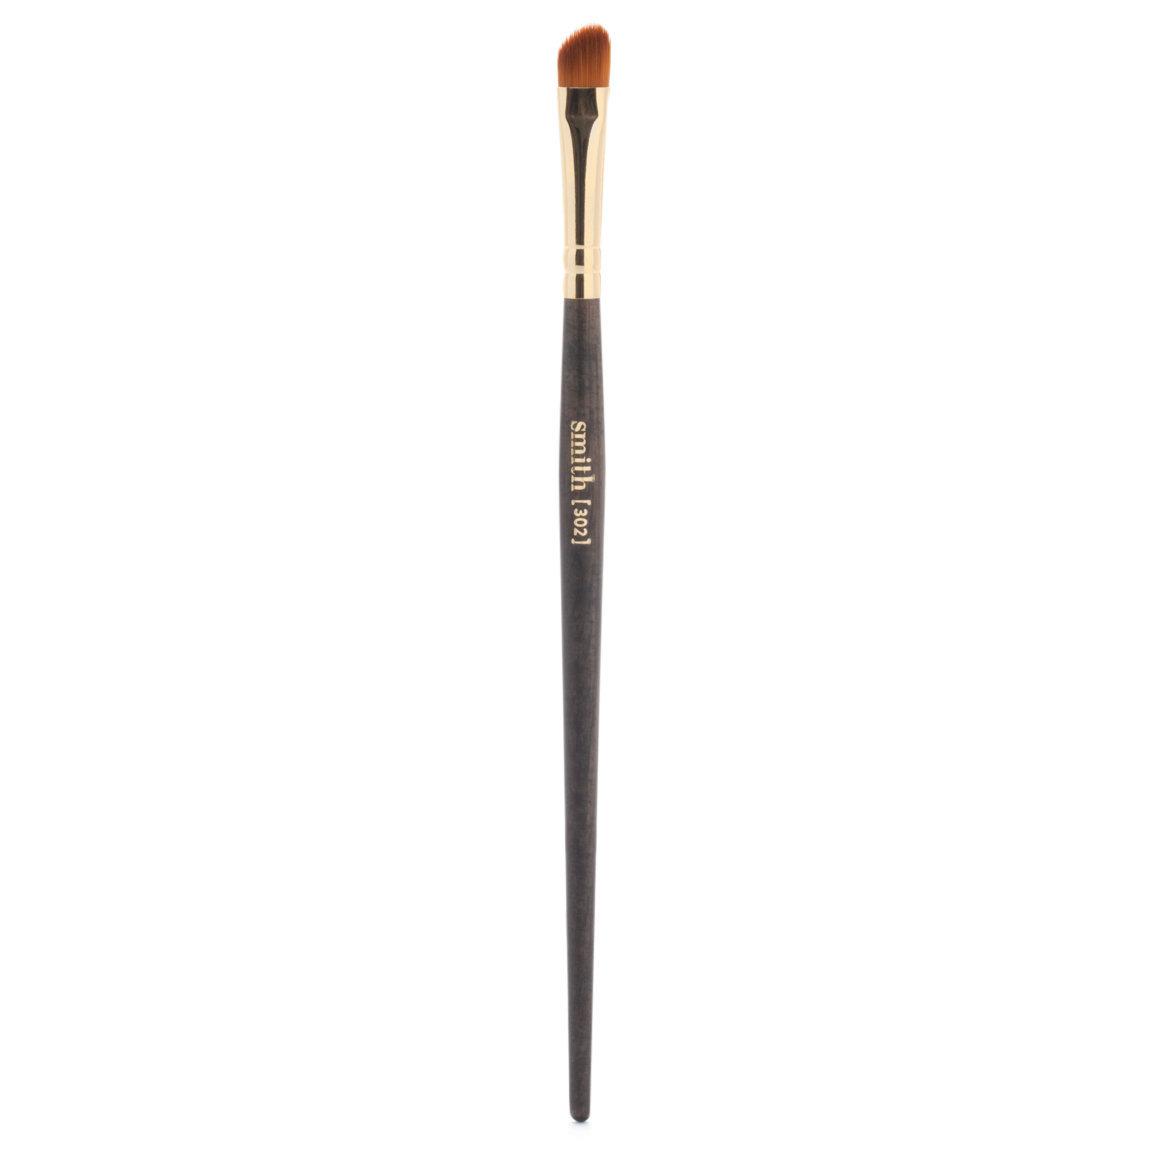 Smith Cosmetics 302 Lip Brush product swatch.